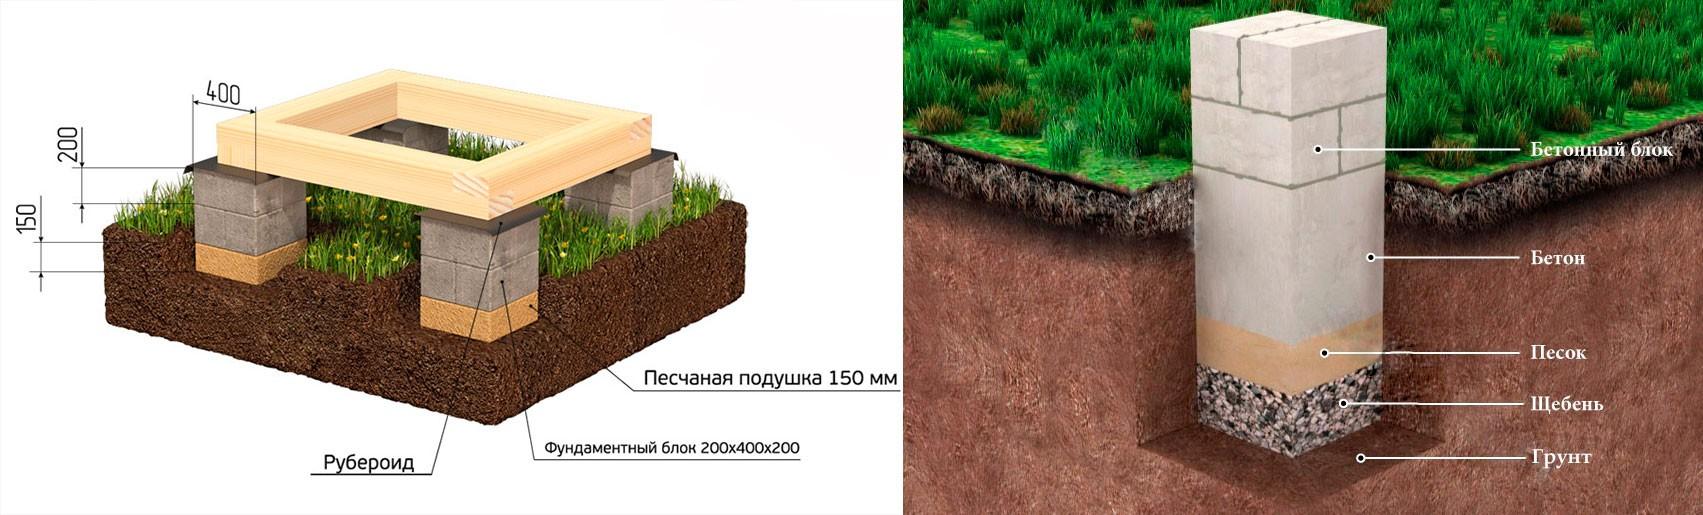 Фундамент своими руками столбчатый блоками